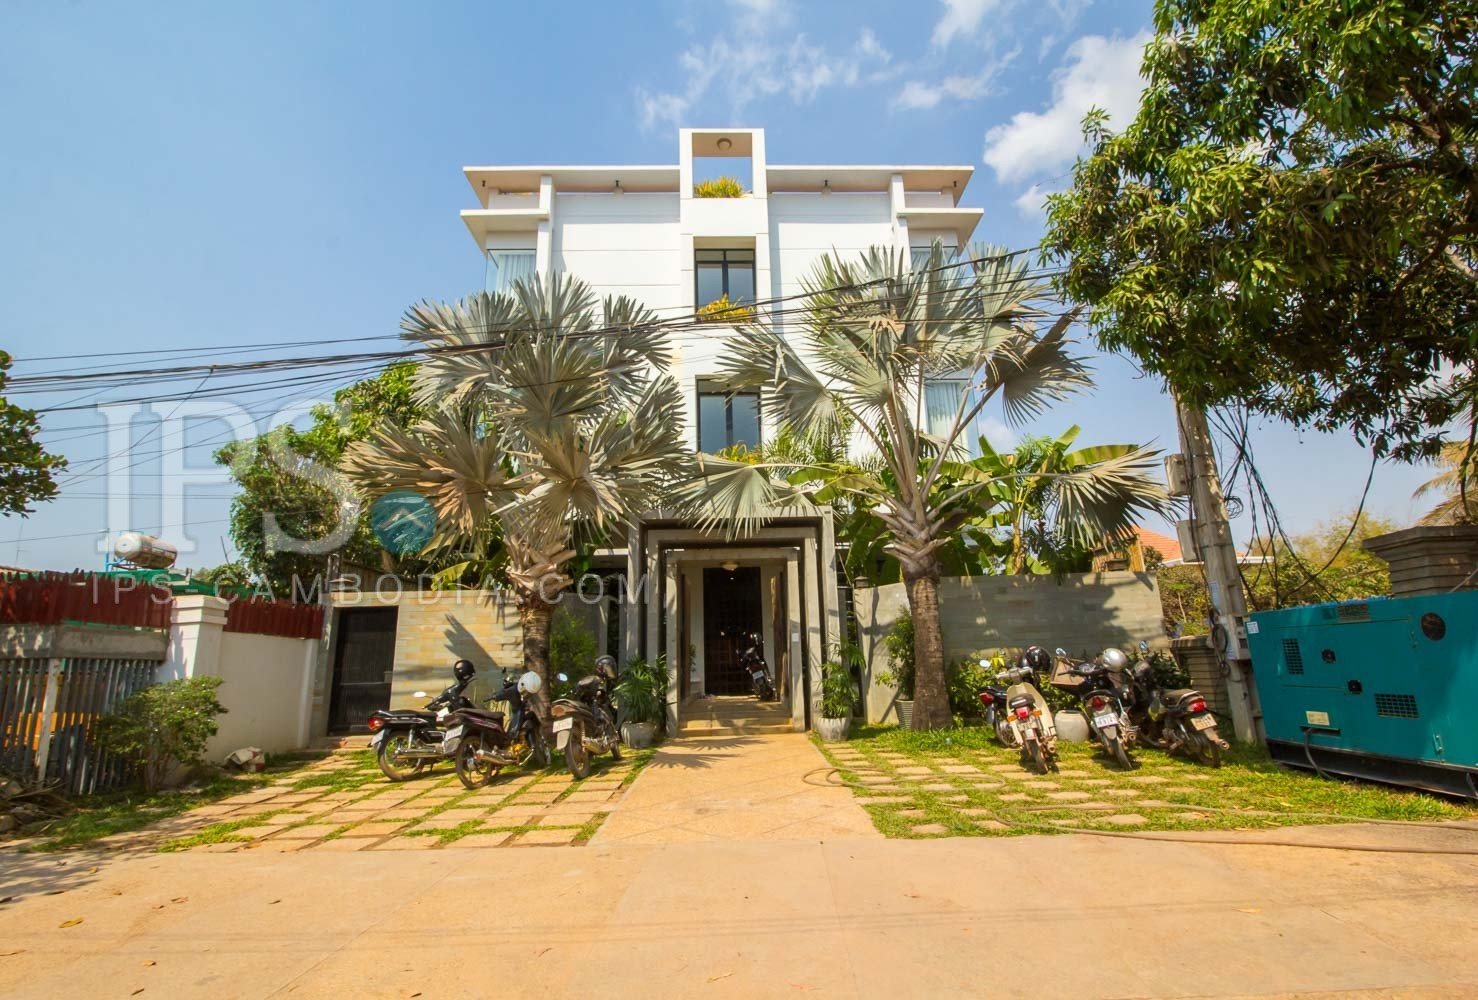 16 Room Hotel For Rent - Svay Dangkum, Siem Reap